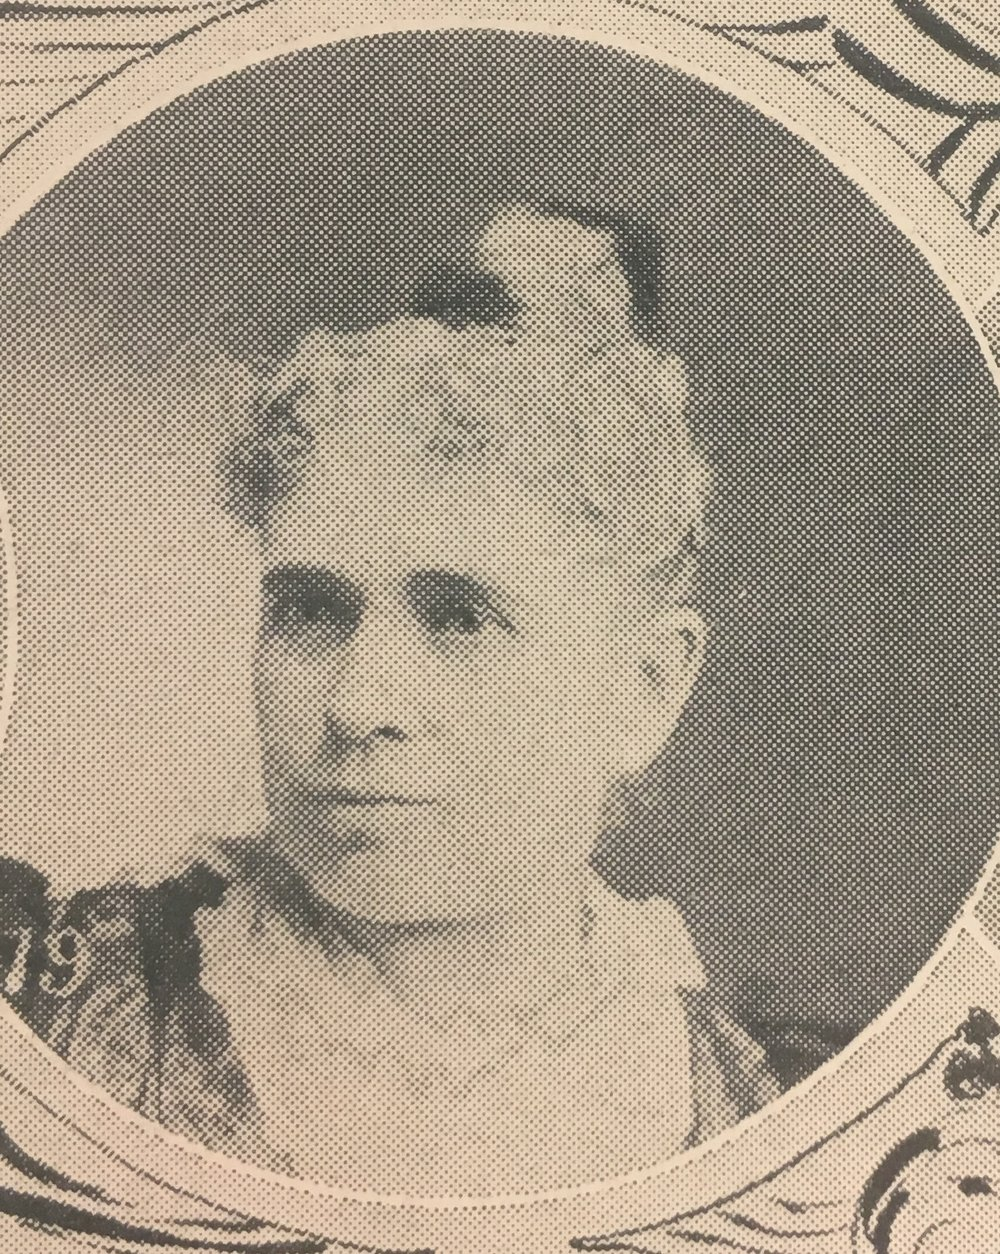 Harriet Walker pic - Copy.jpg